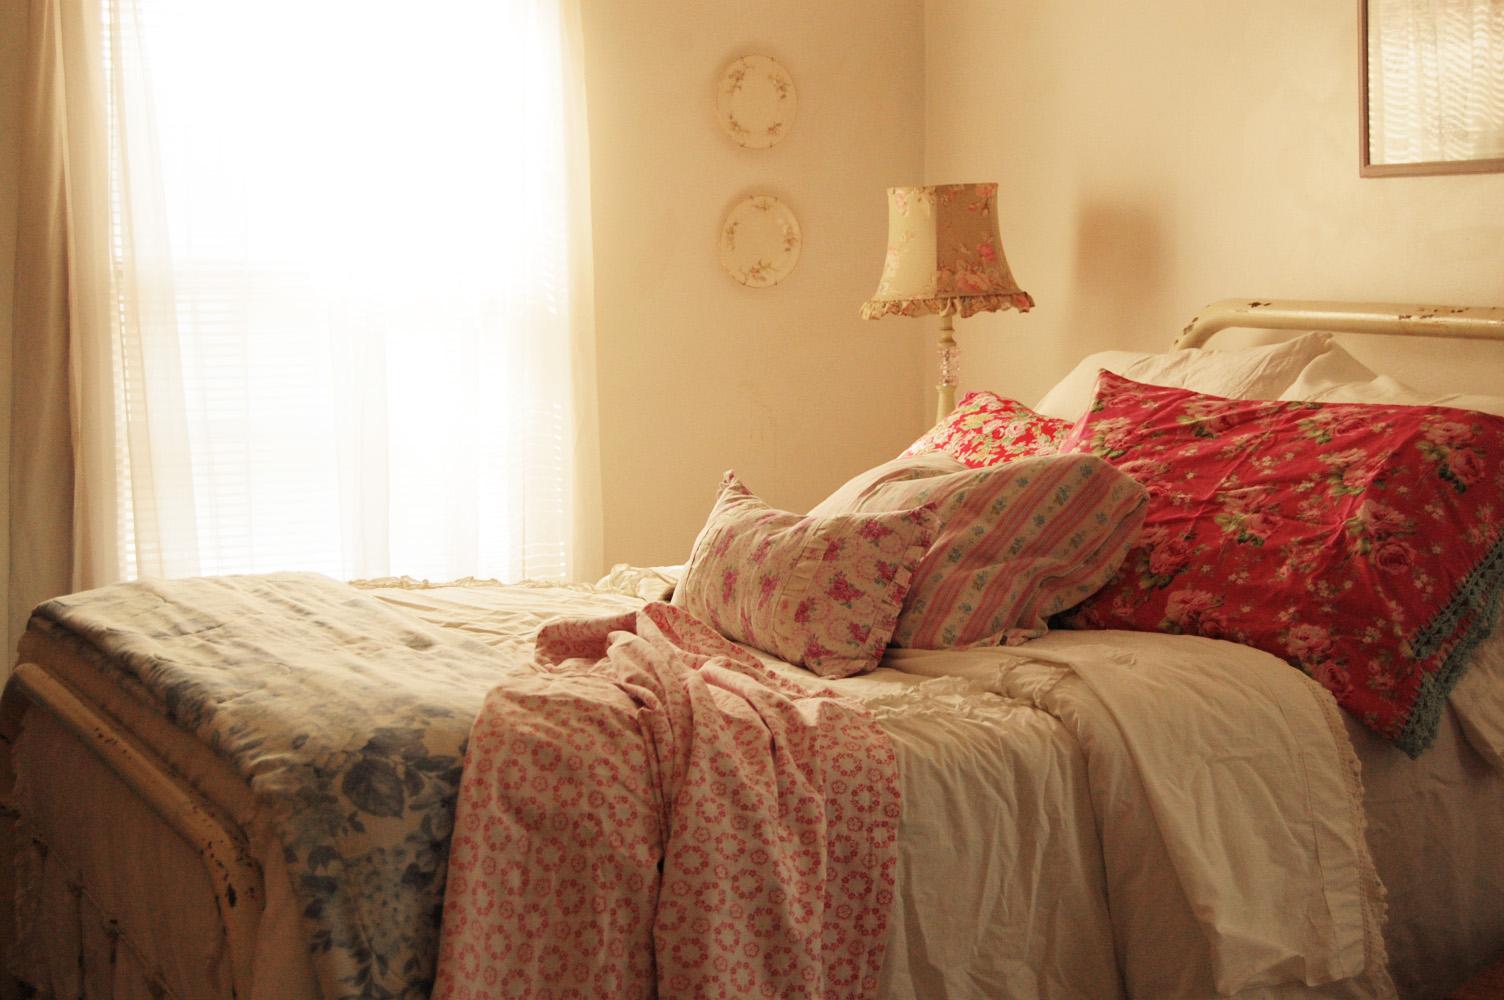 Farmhouse Life: My simple Cozy Bedroom